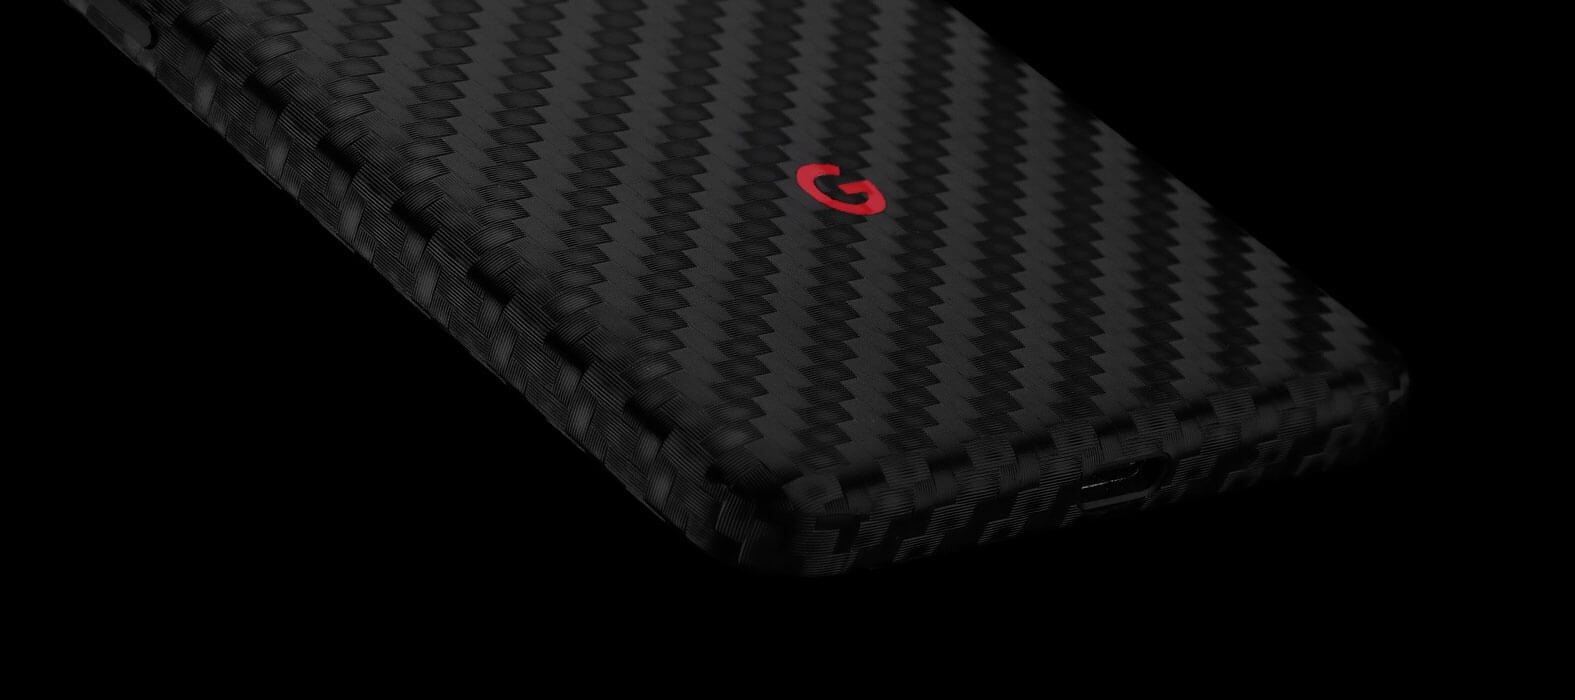 Pixel 2 Wraps, Skins, Decals, Black Carbon Fiber